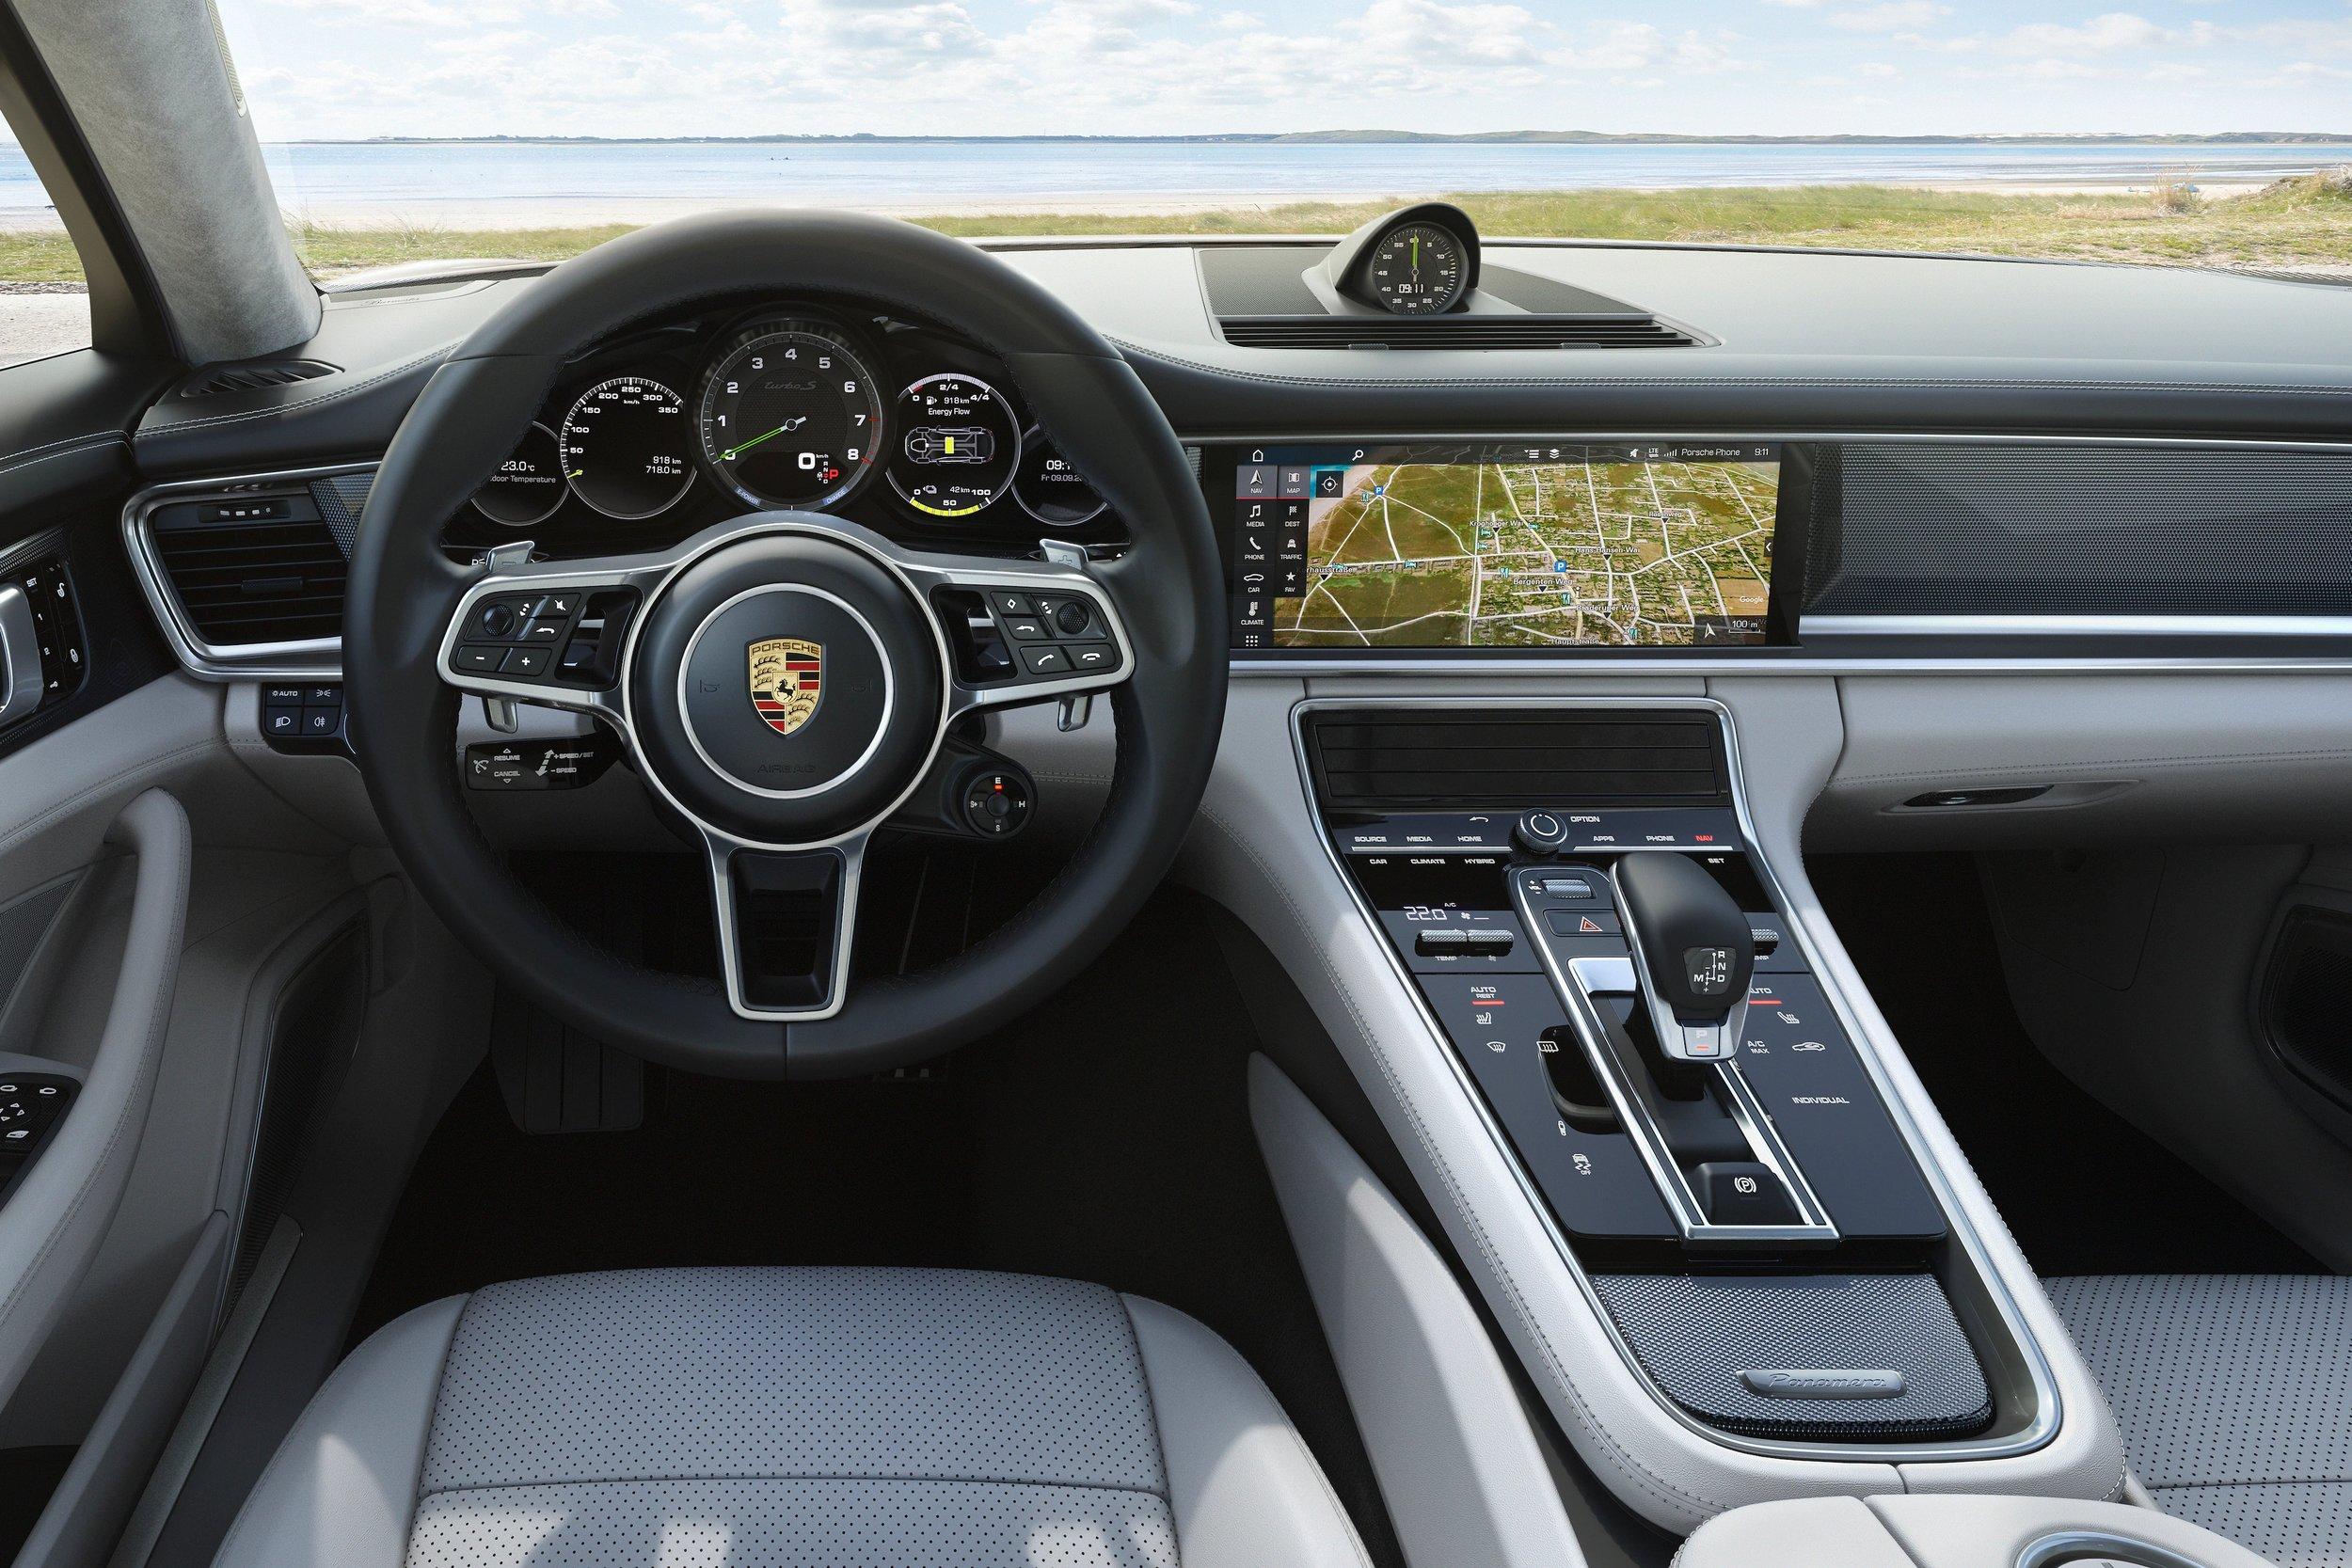 Blacklist-Panamera S E-Hybrid Sport Turismo7.jpg